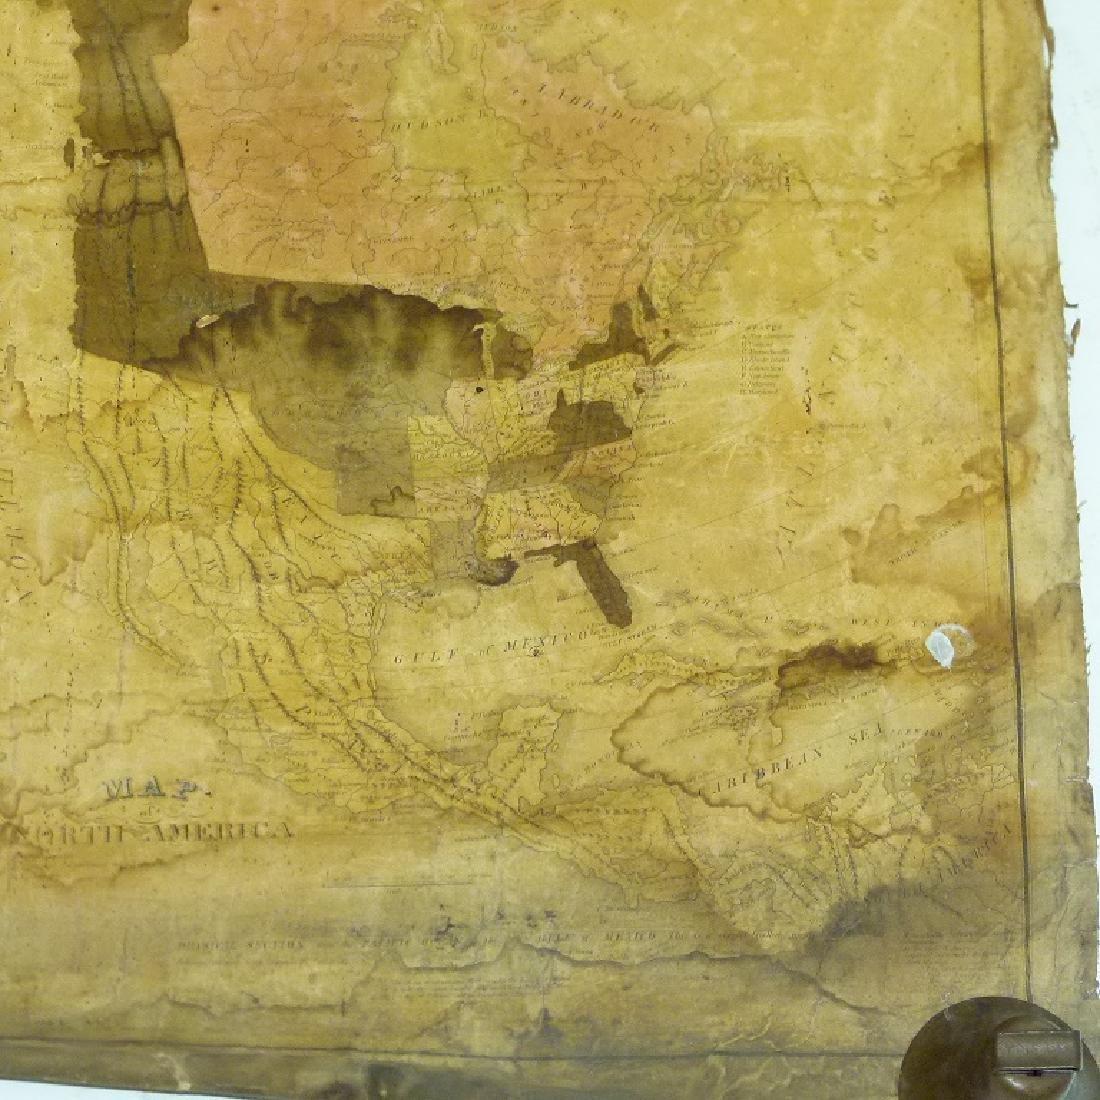 MAP OF UNITED STATES, C. VARLE 1832 - 6